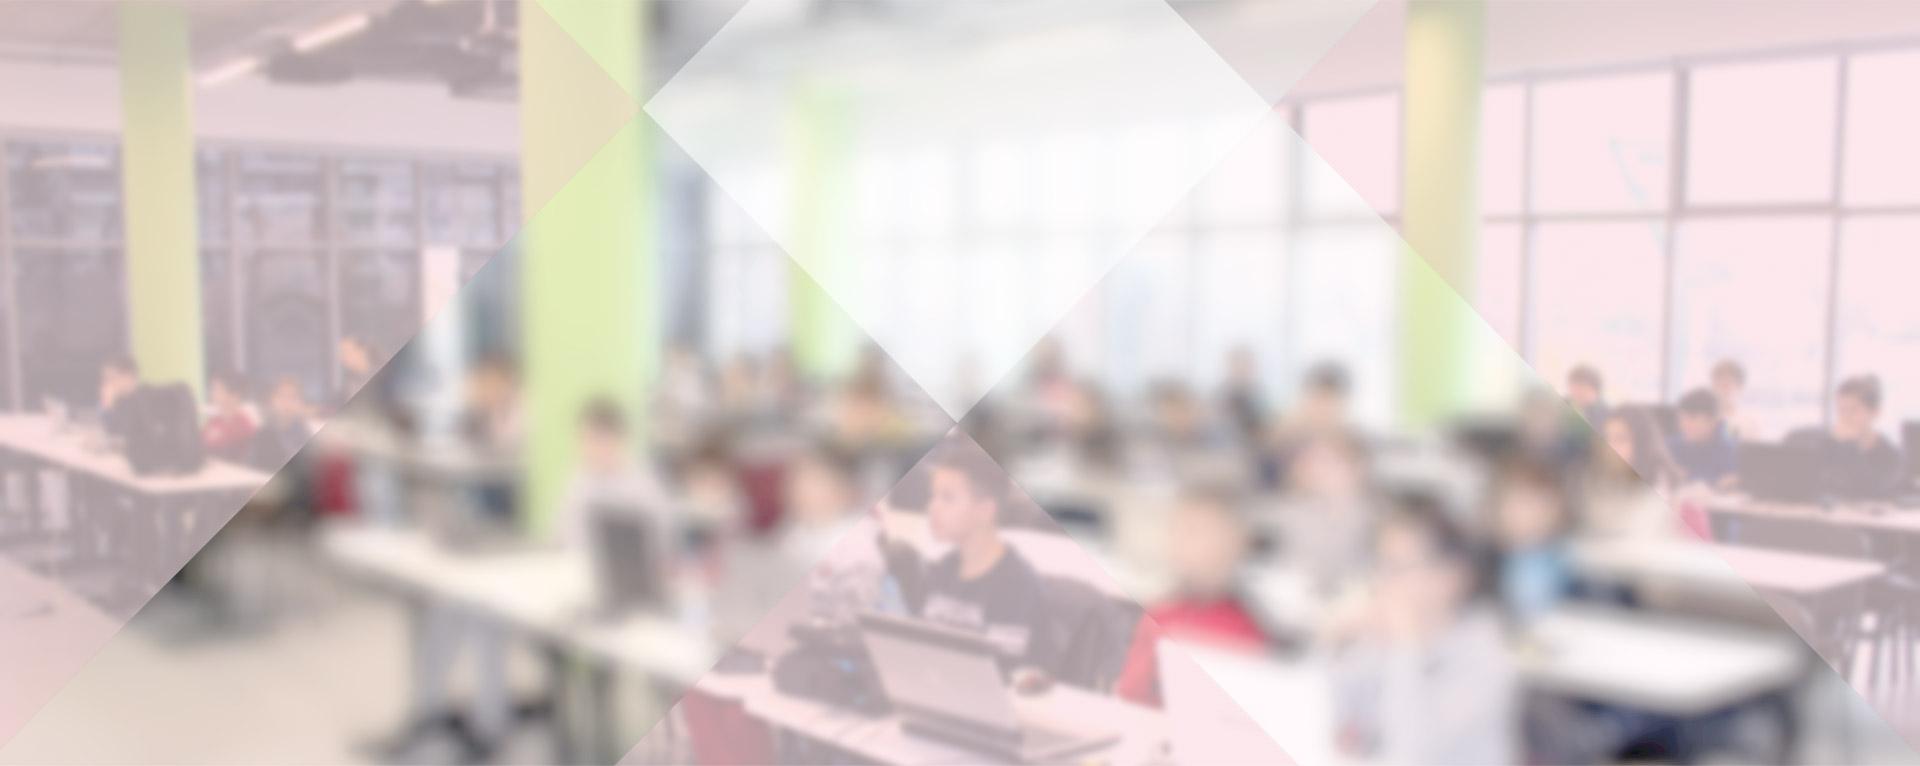 school-homepage-banner-2